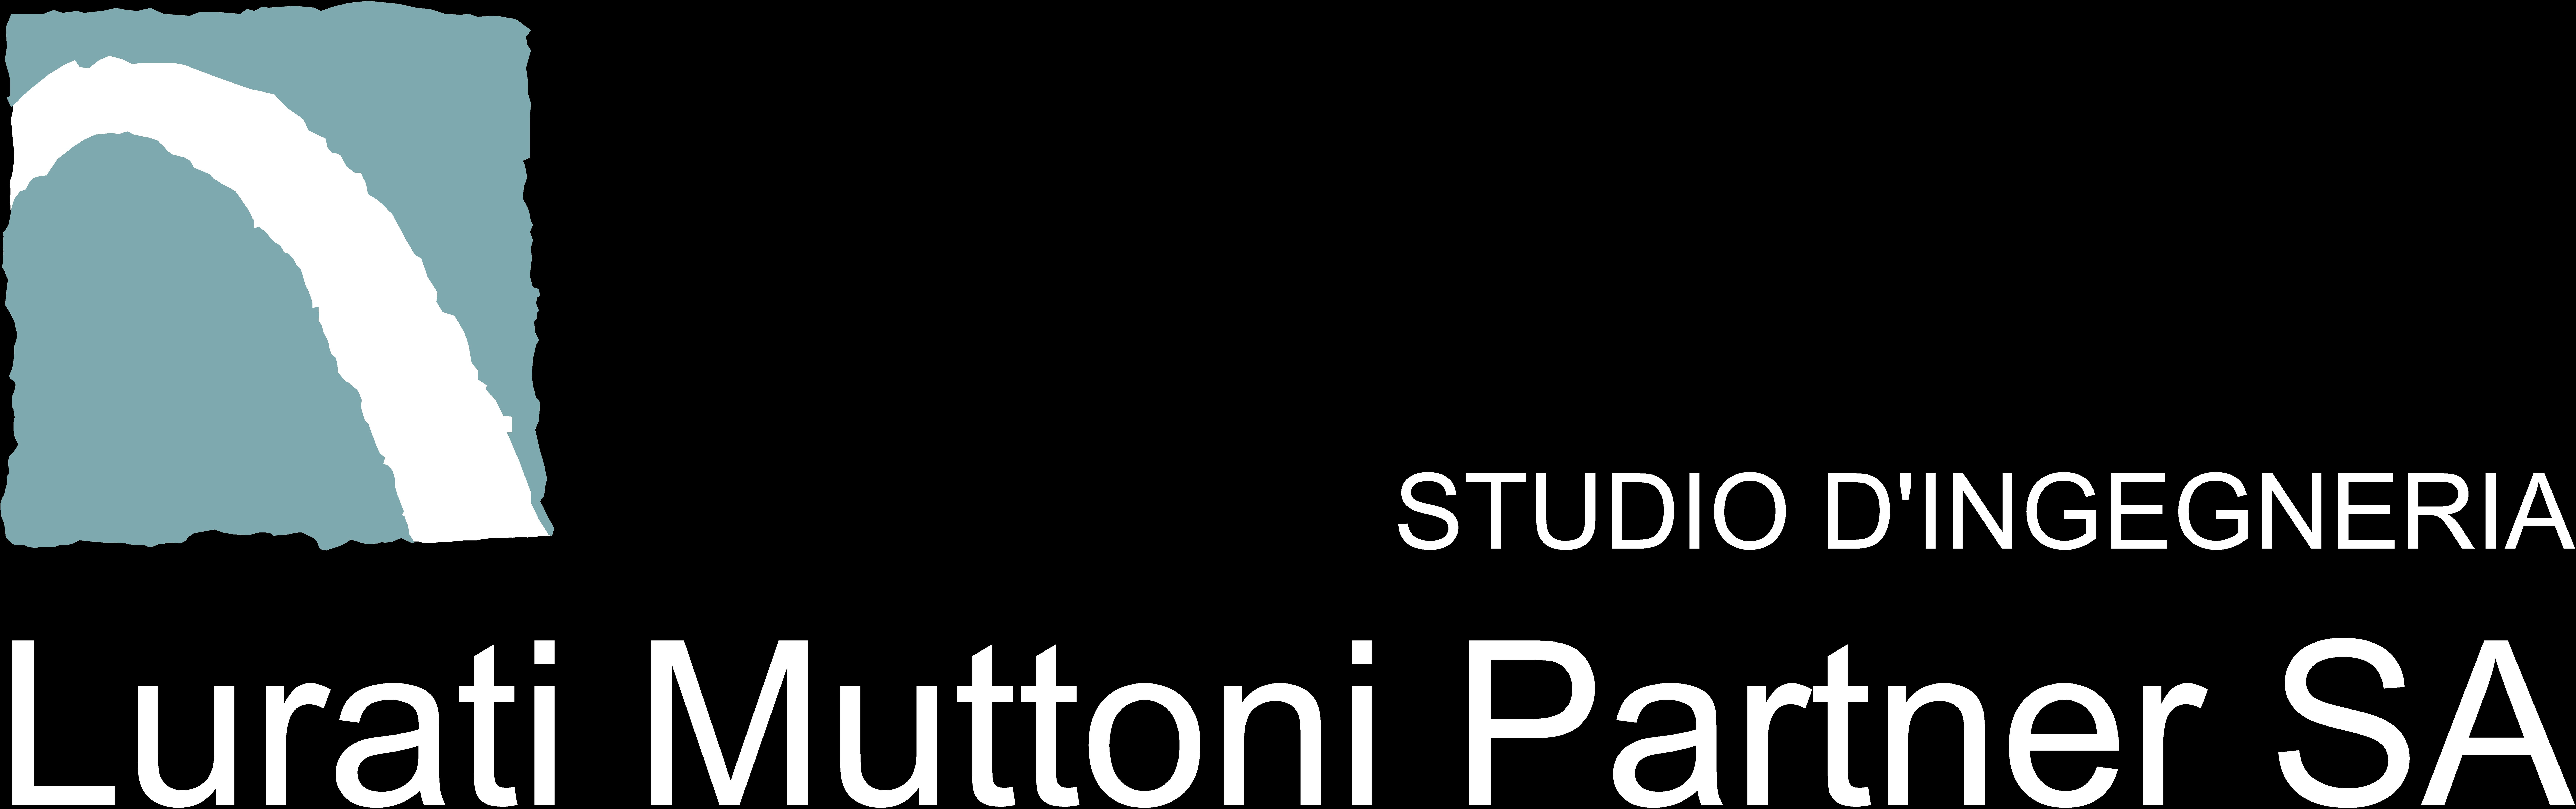 Studio d'ingegneria Lurati Muttoni Partner SA